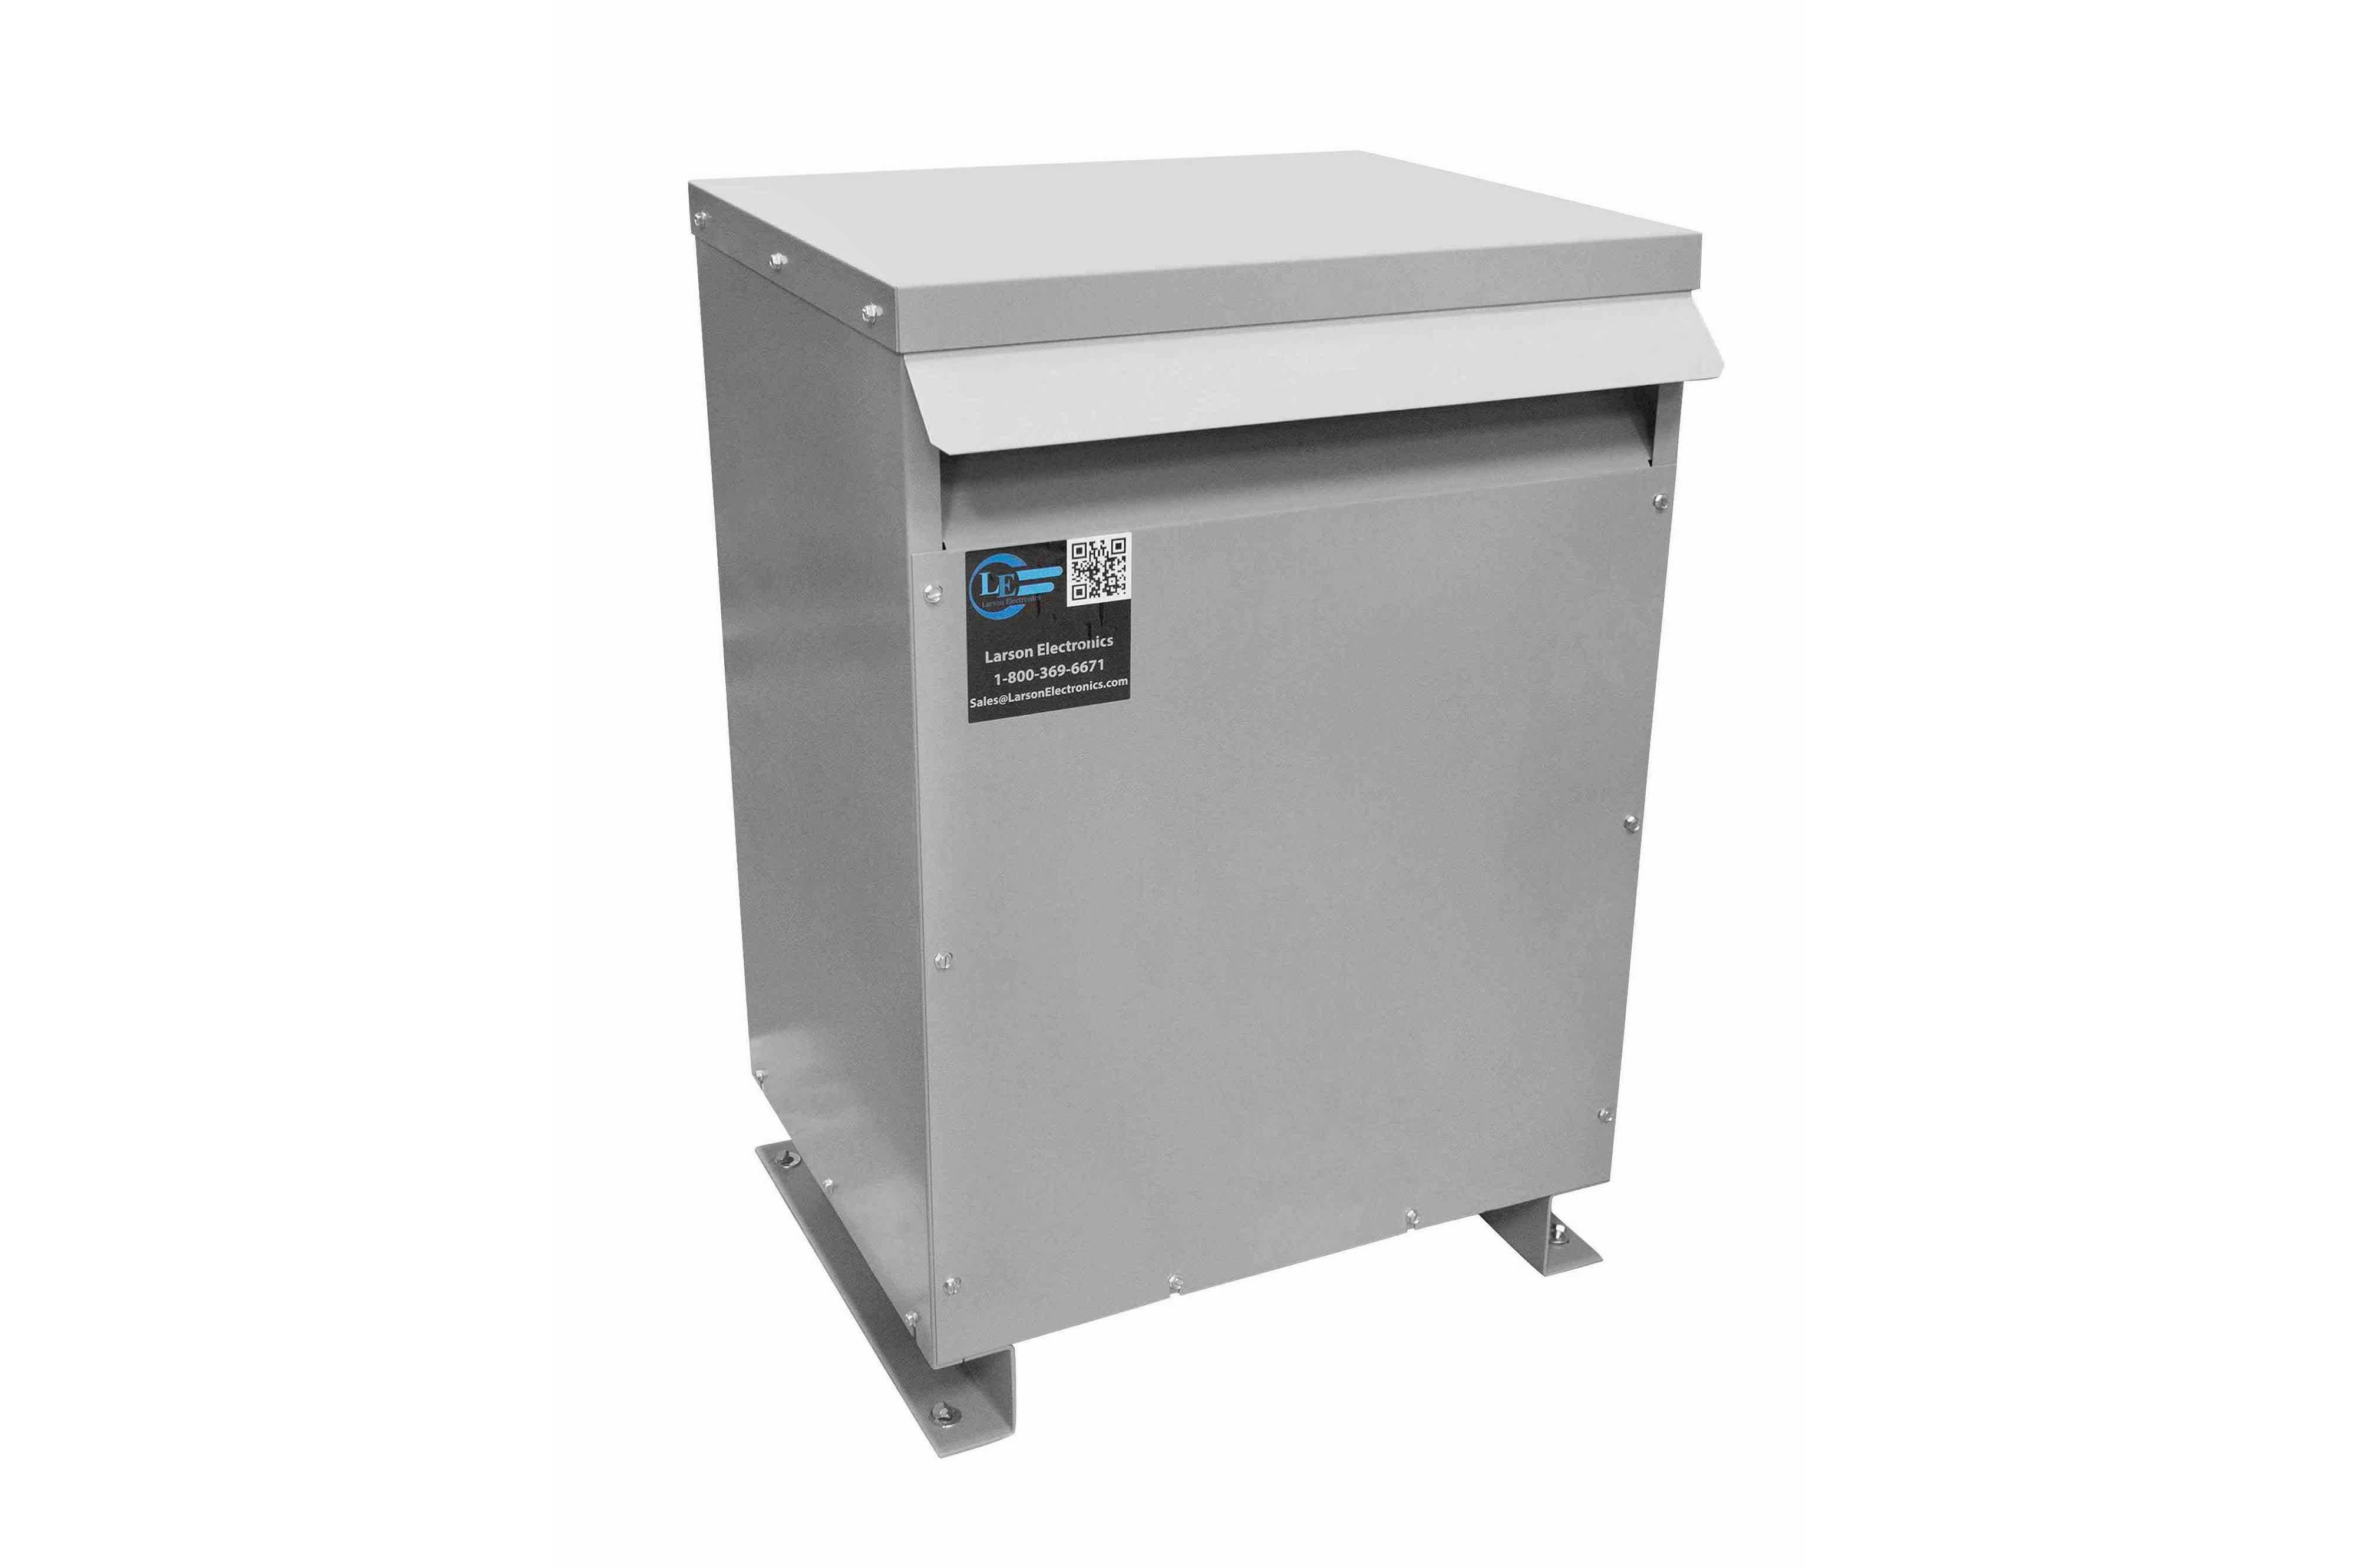 65 kVA 3PH Isolation Transformer, 460V Wye Primary, 575V Delta Secondary, N3R, Ventilated, 60 Hz